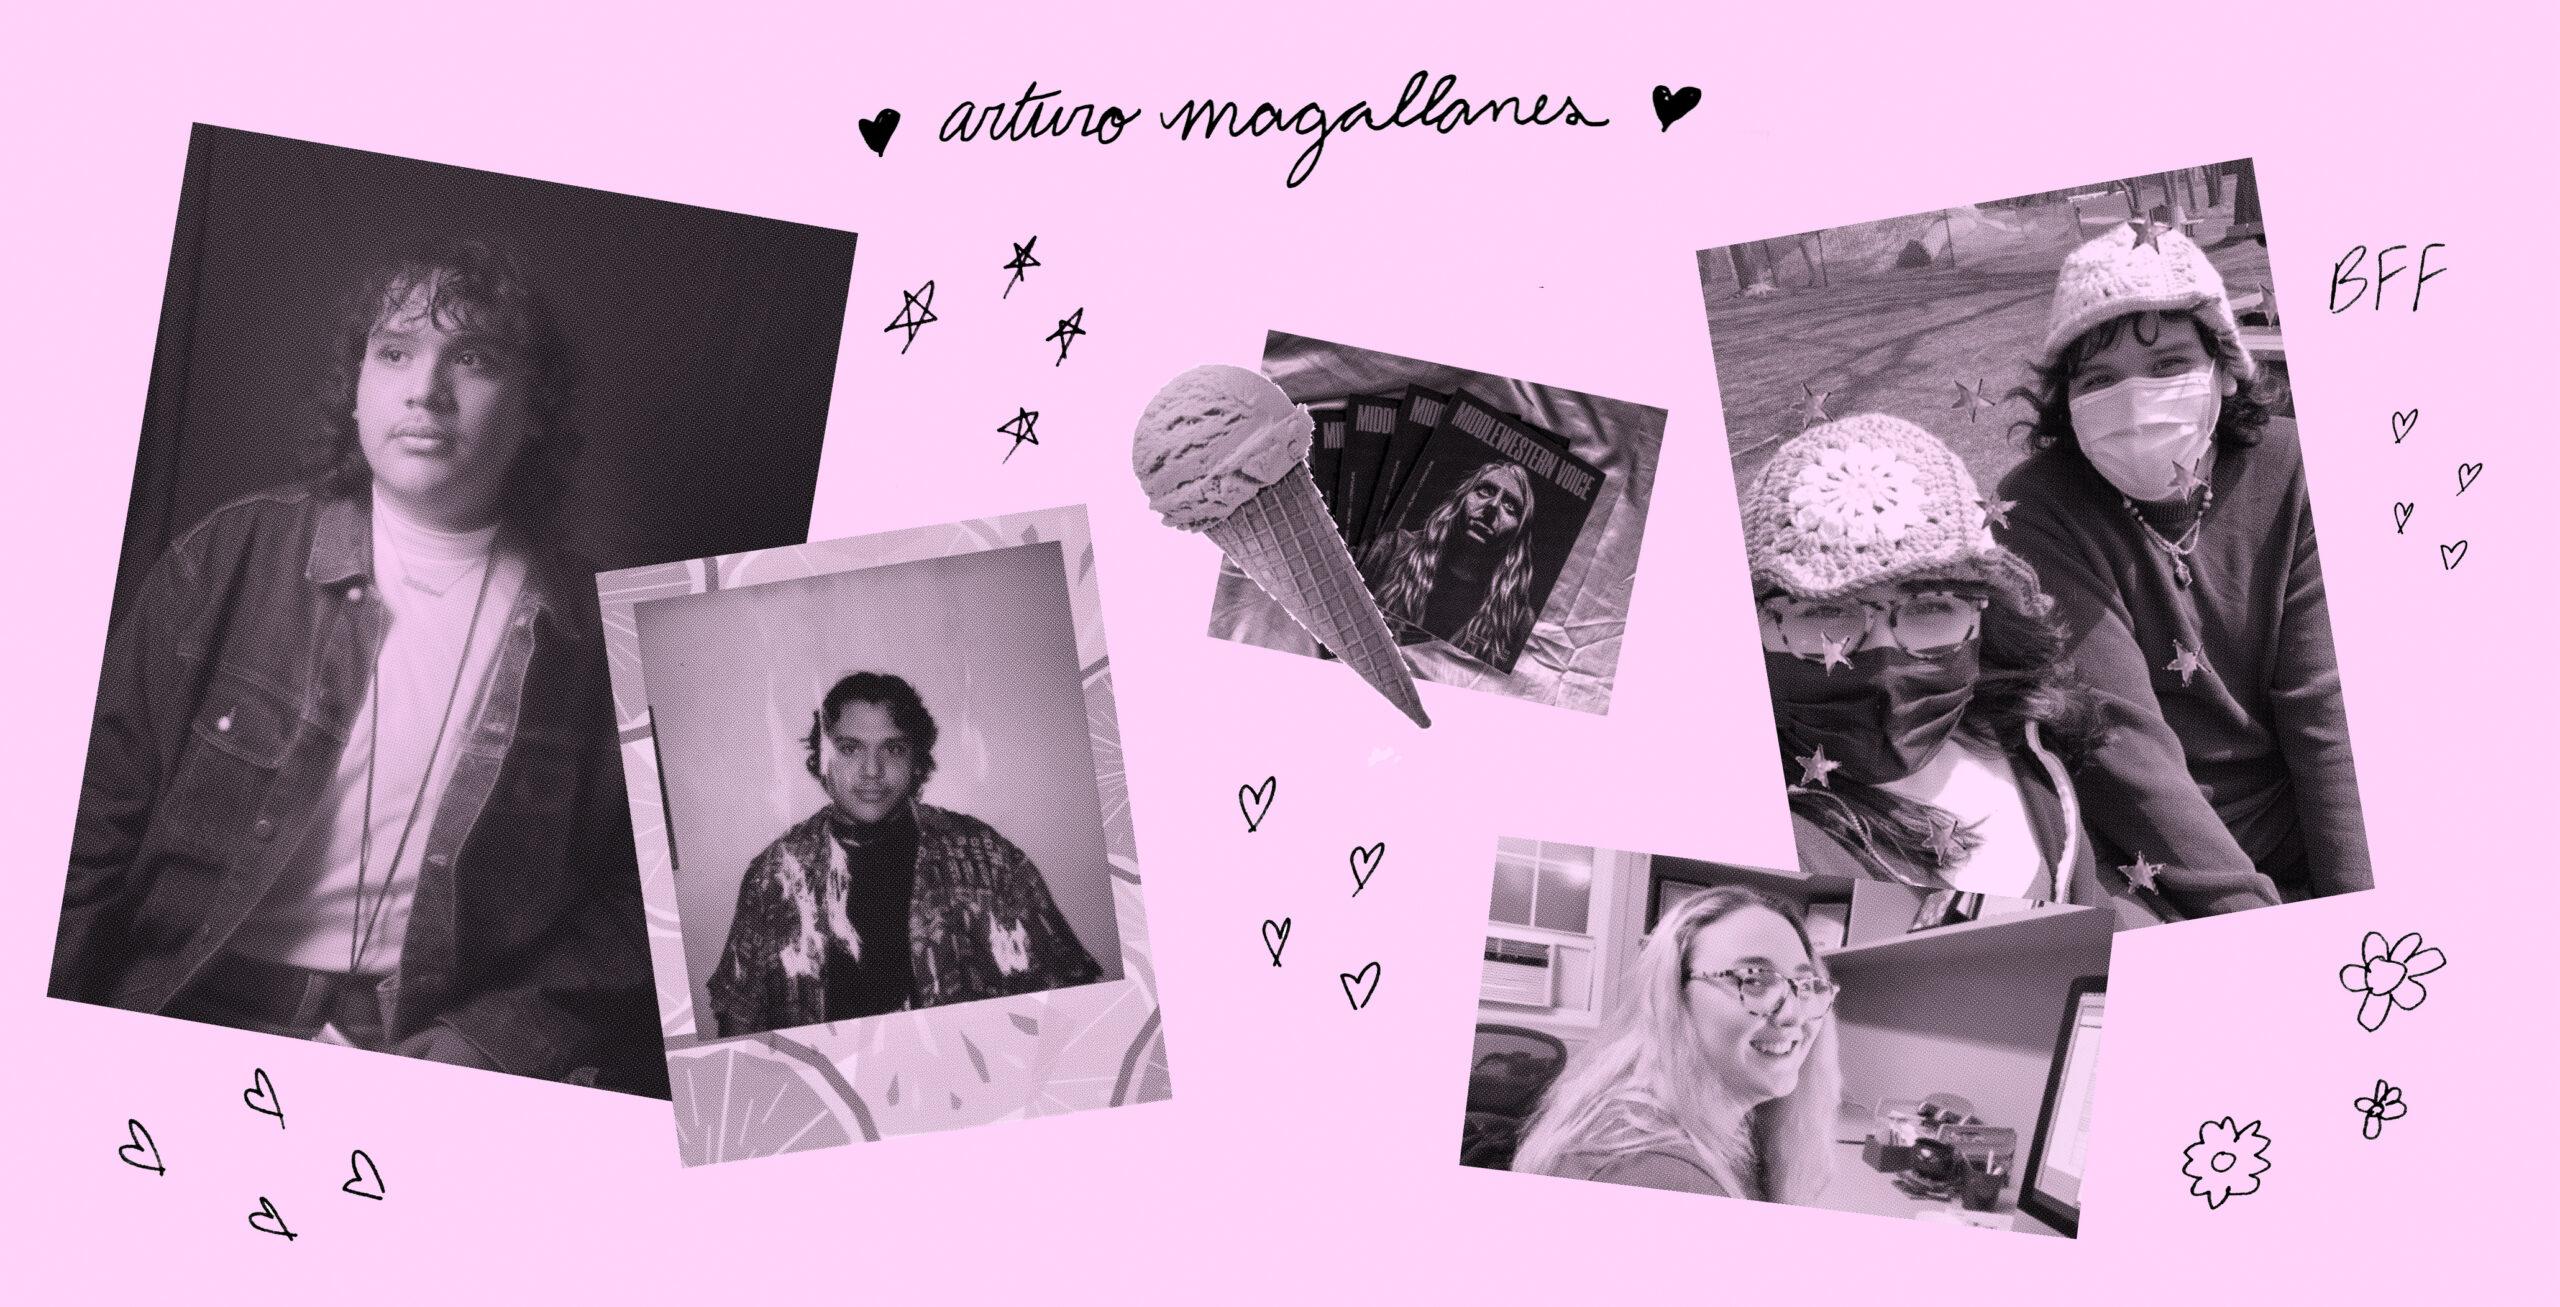 Senior Memoir—Arturo Magallanes